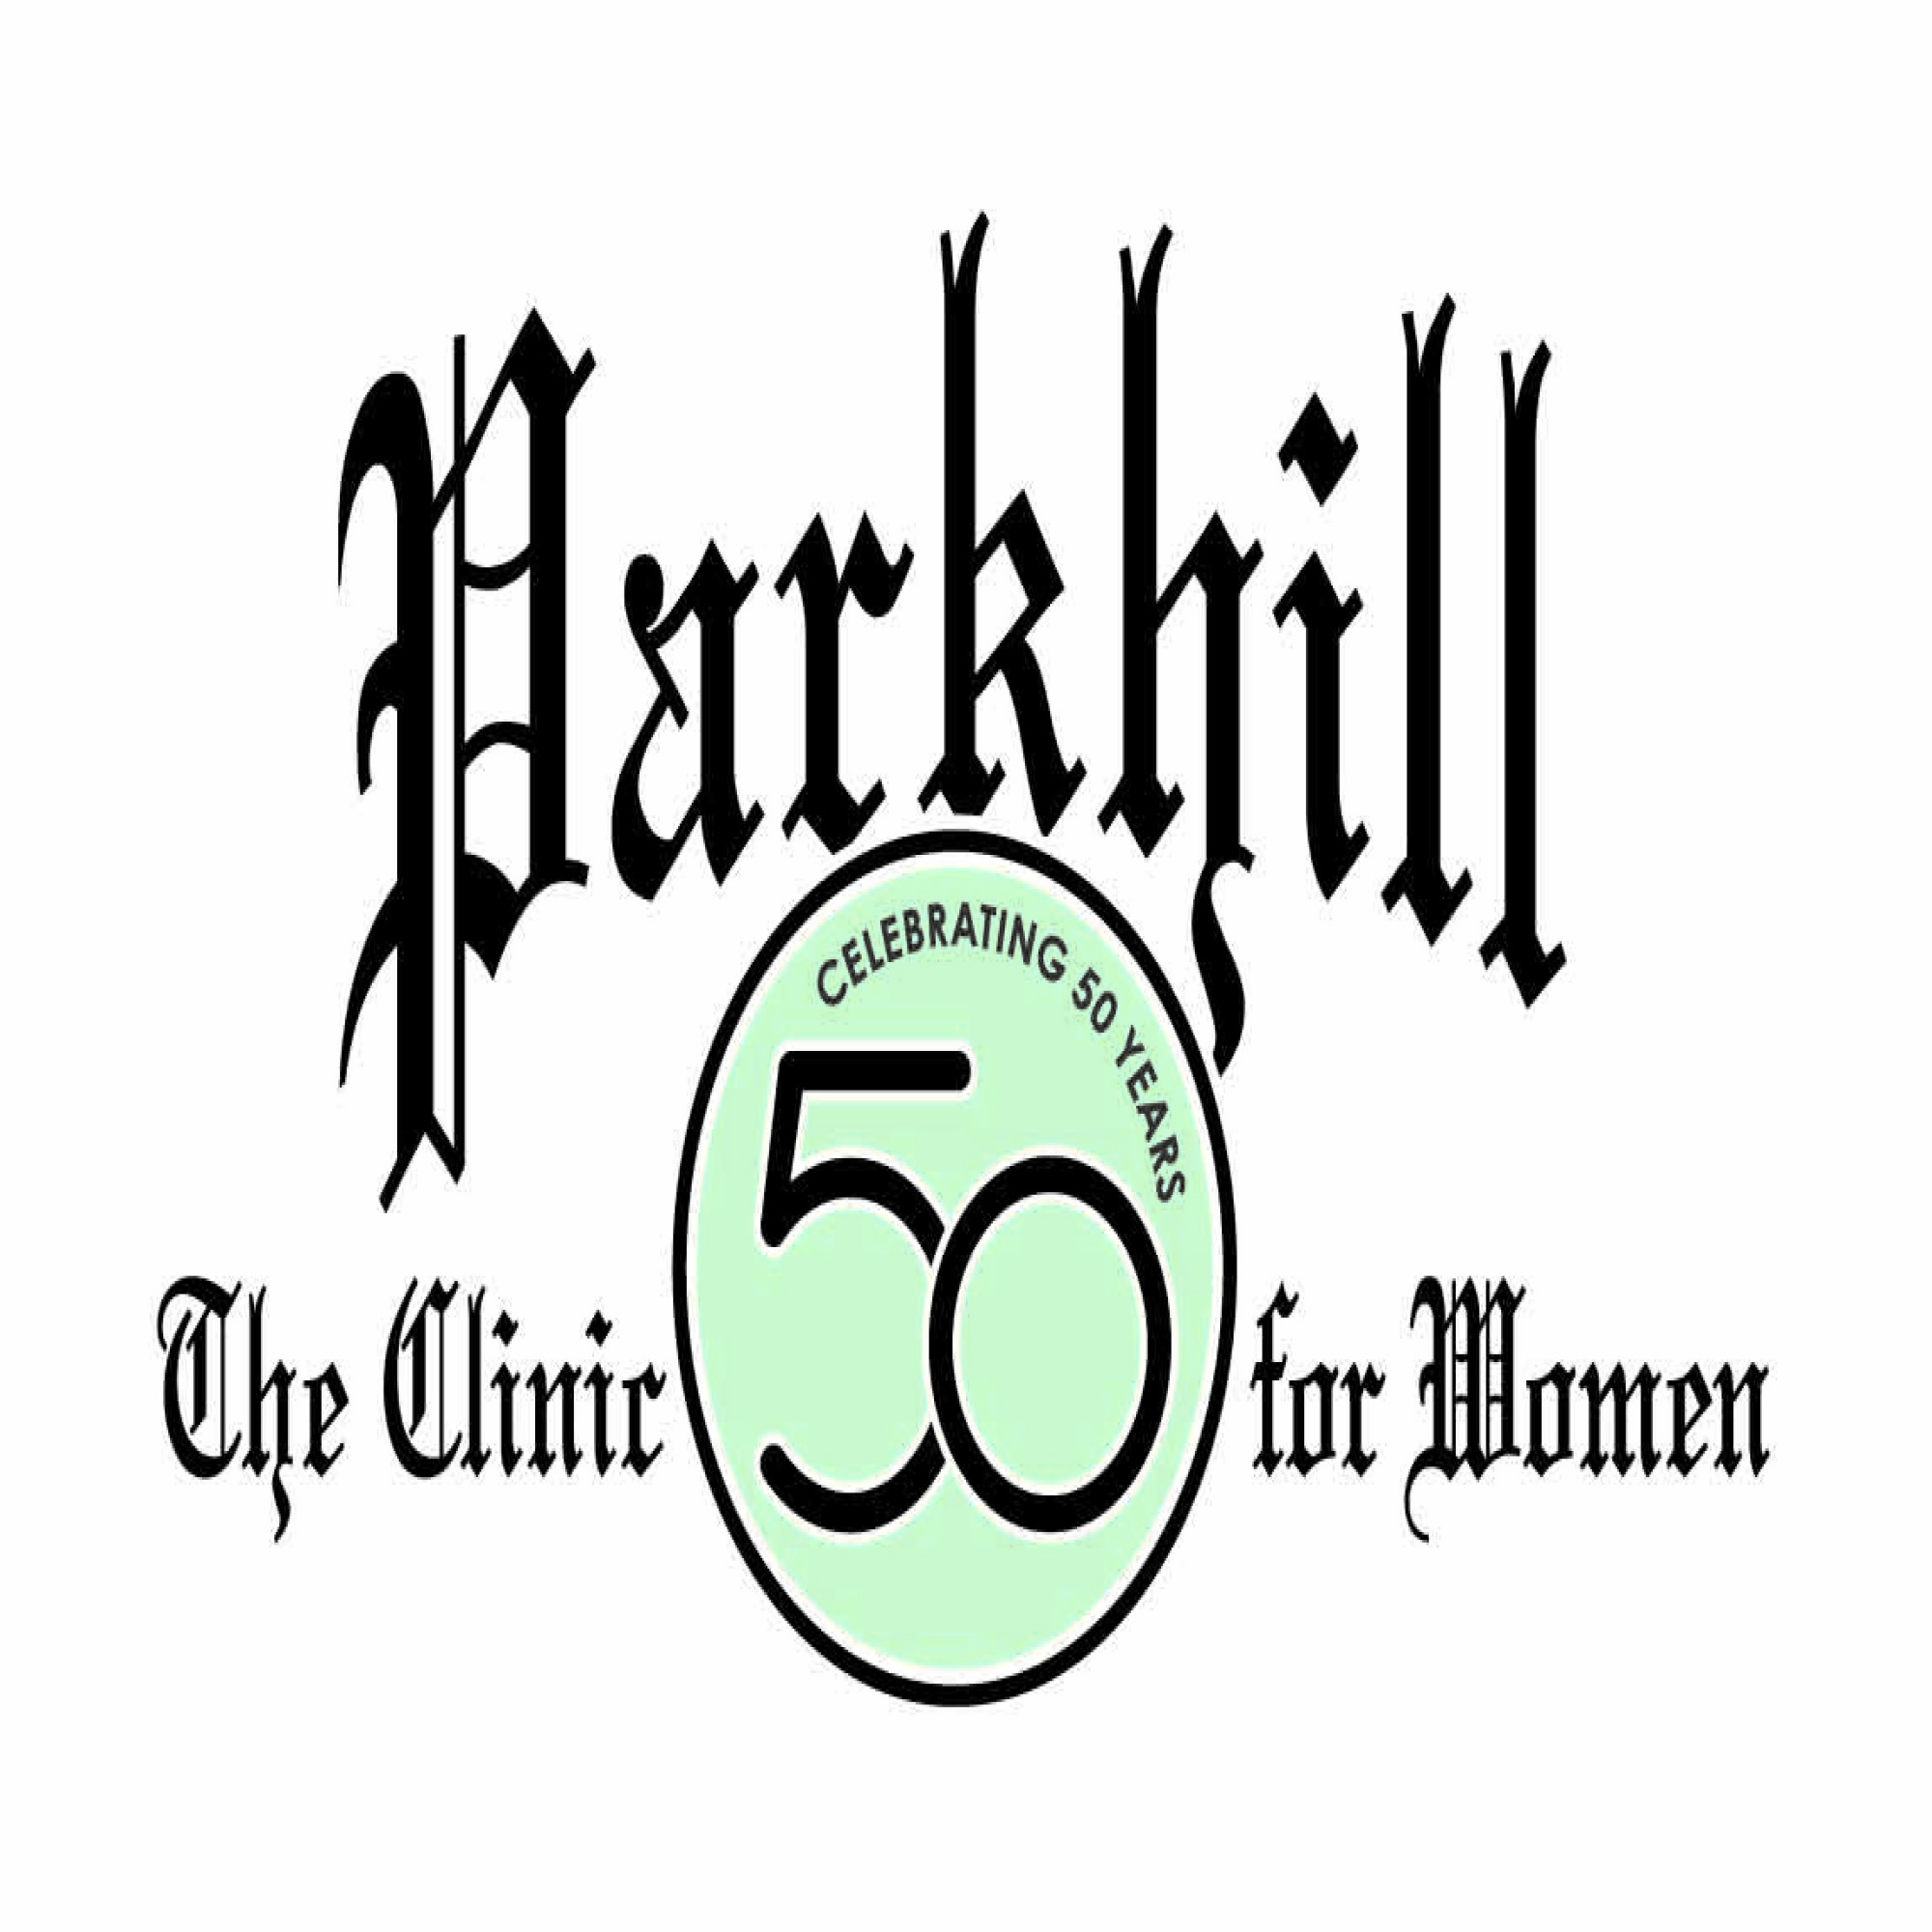 ParkhillClinic_LOGO-01